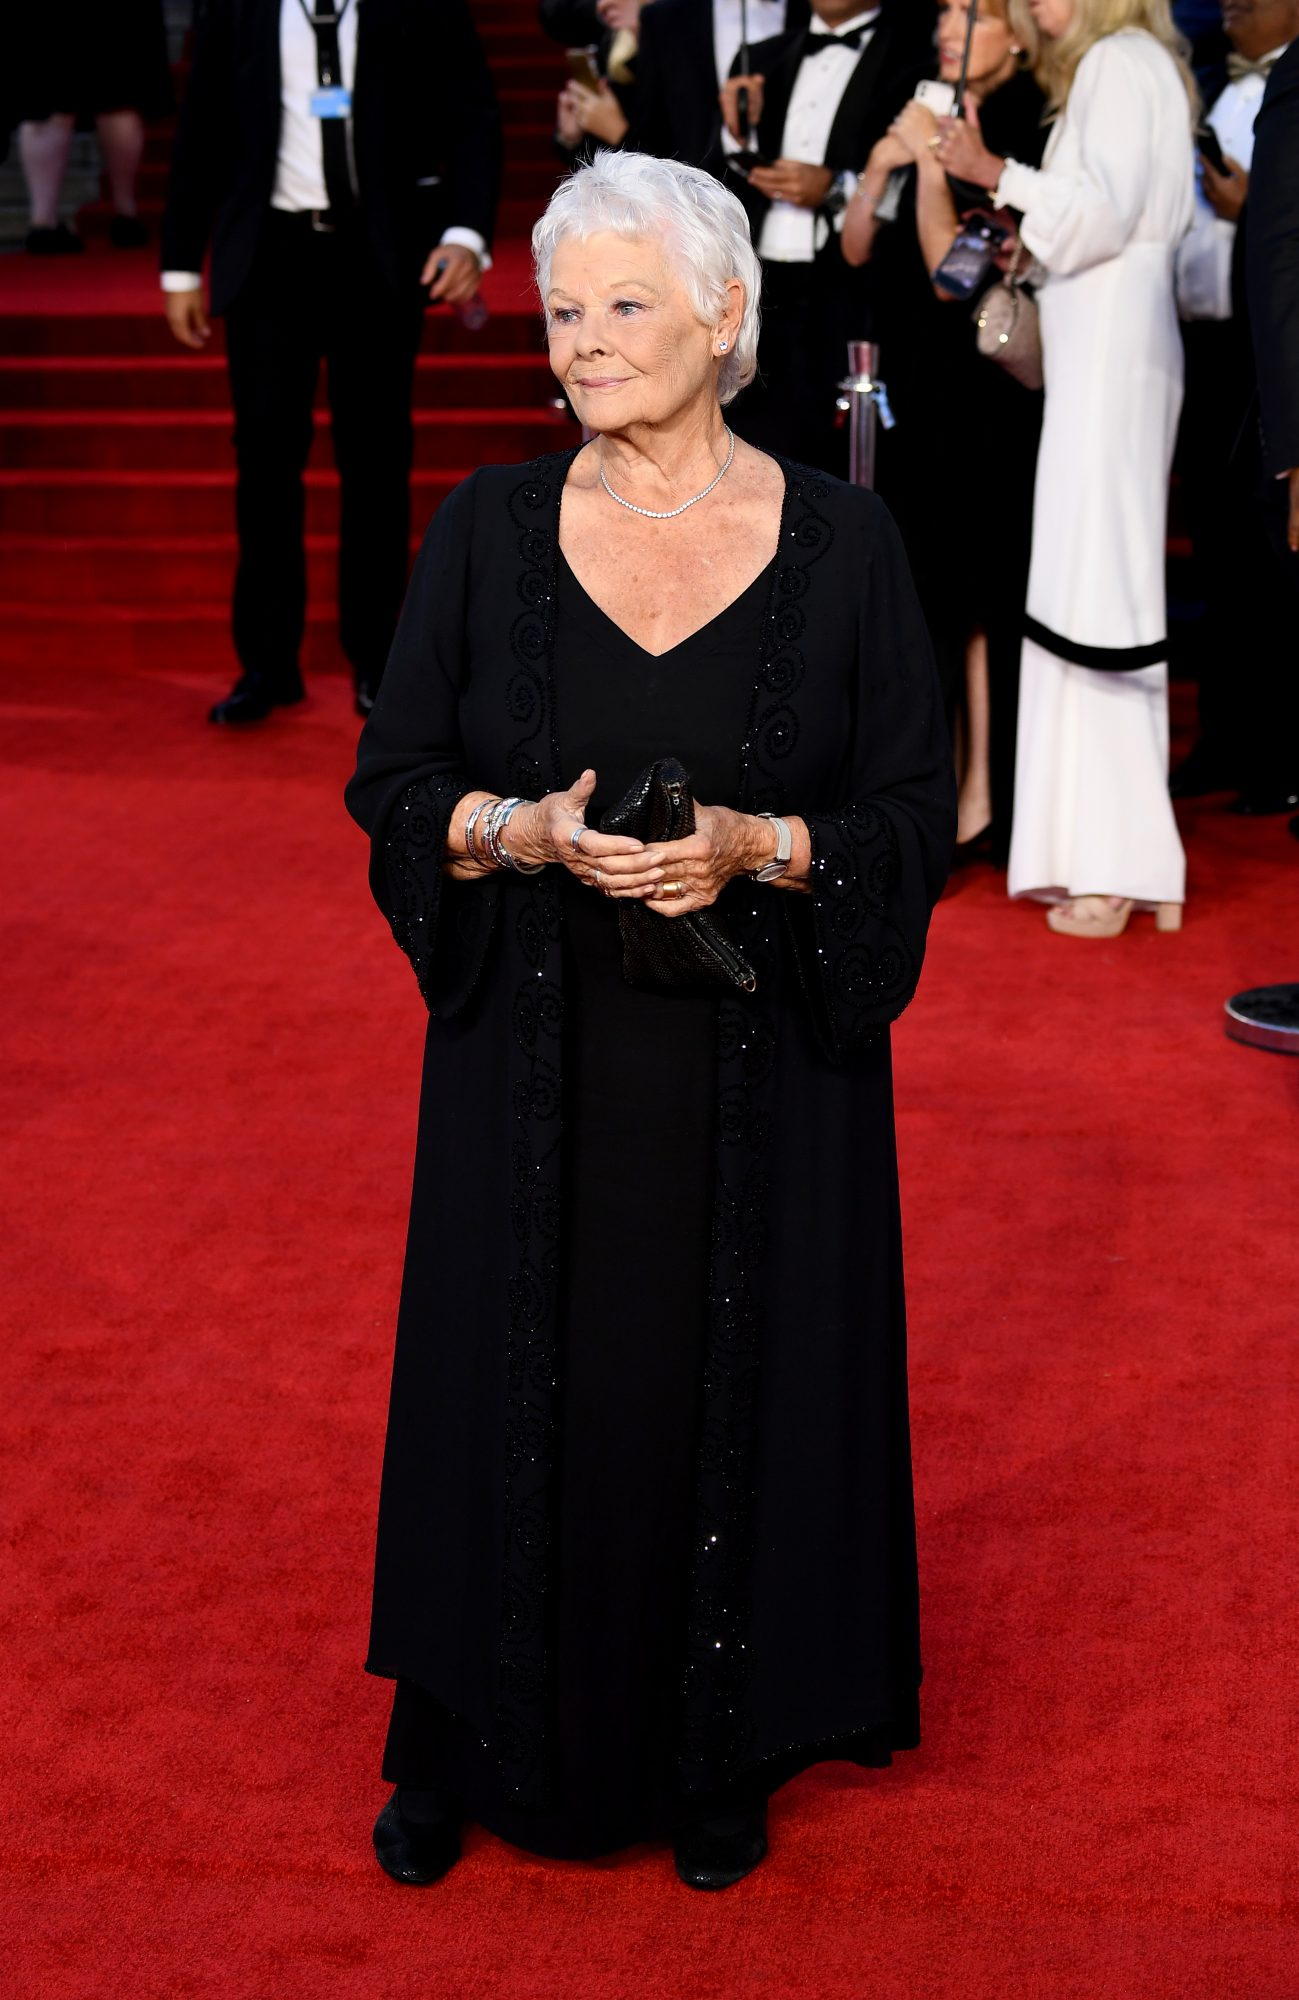 James Bond, No Time to Die estreno, alfombra roja, Judi Dench